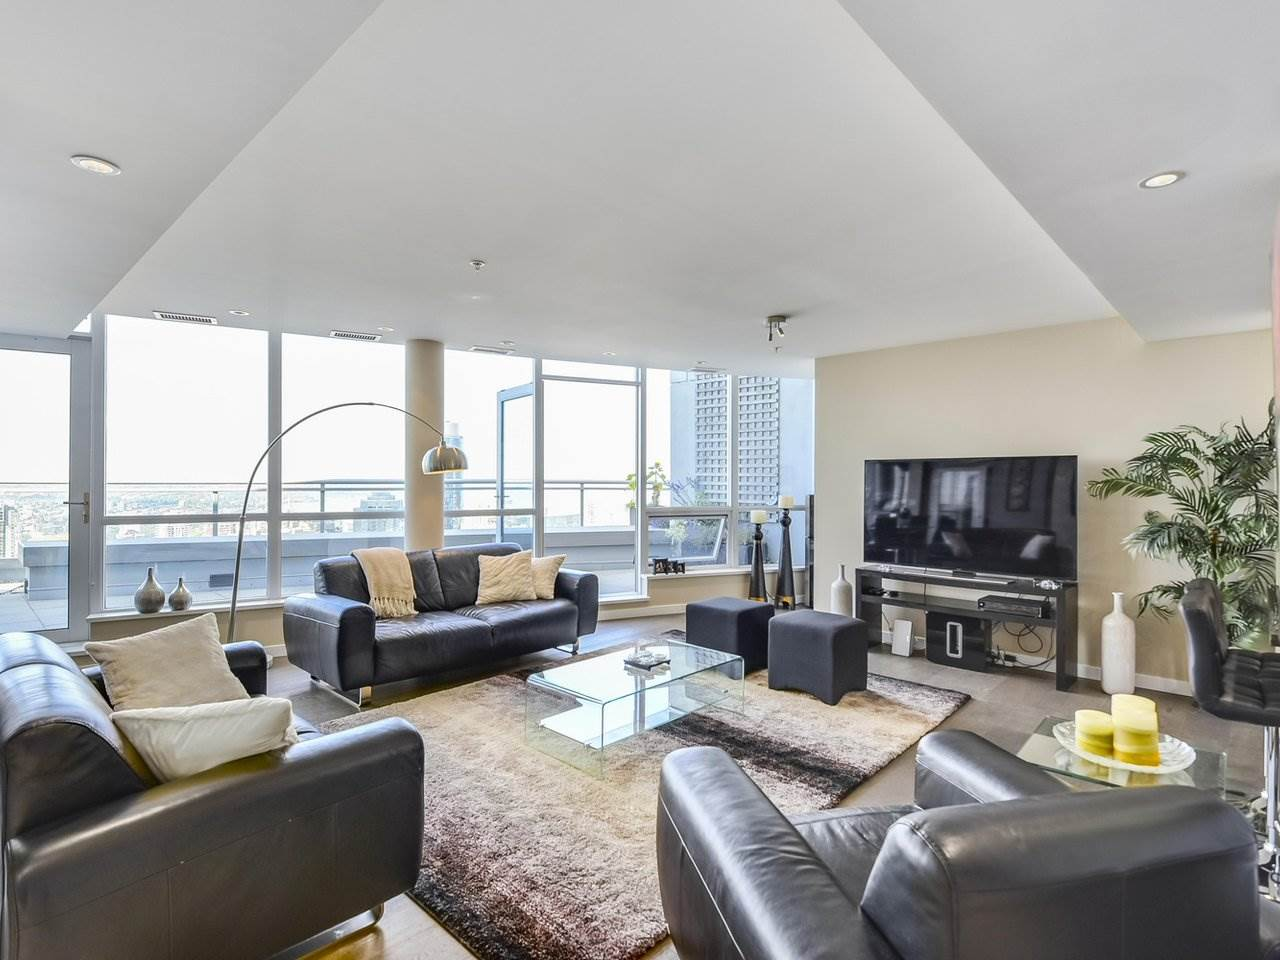 Condo Apartment at PH3 833 SEYMOUR STREET, Unit PH3, Vancouver West, British Columbia. Image 3